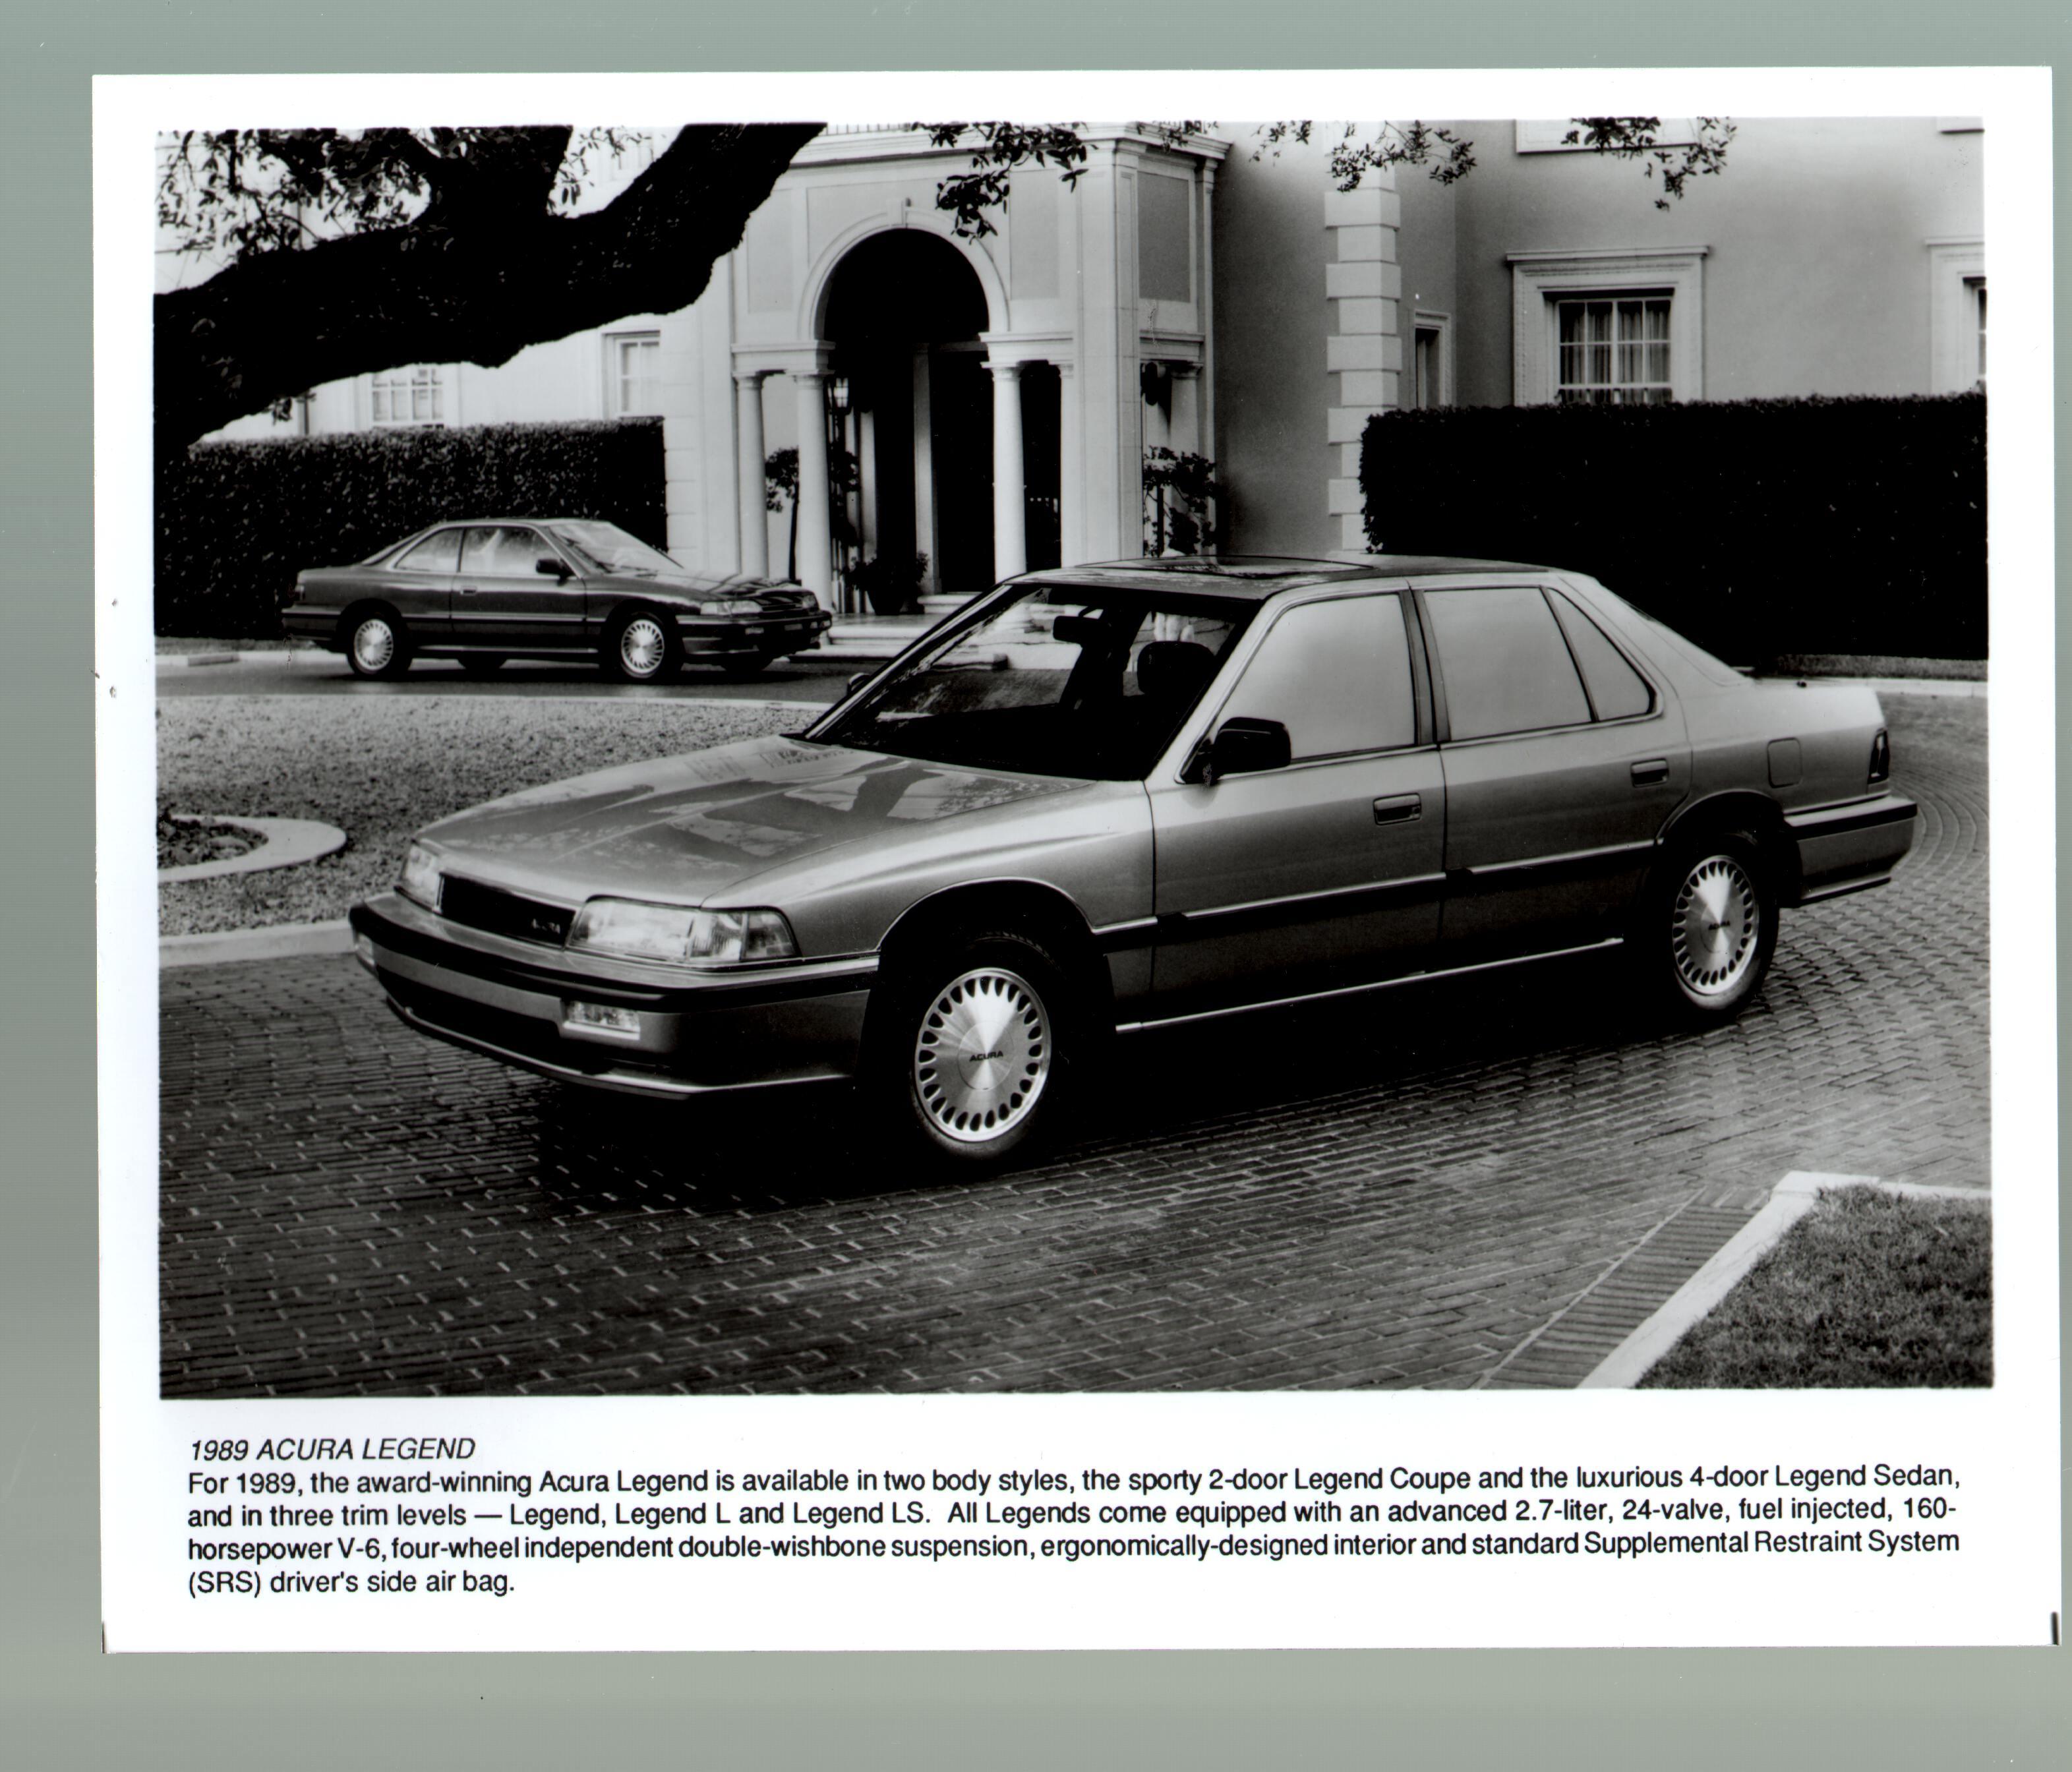 1989 Acura Legend-8x10-B&W-Promotional Still: